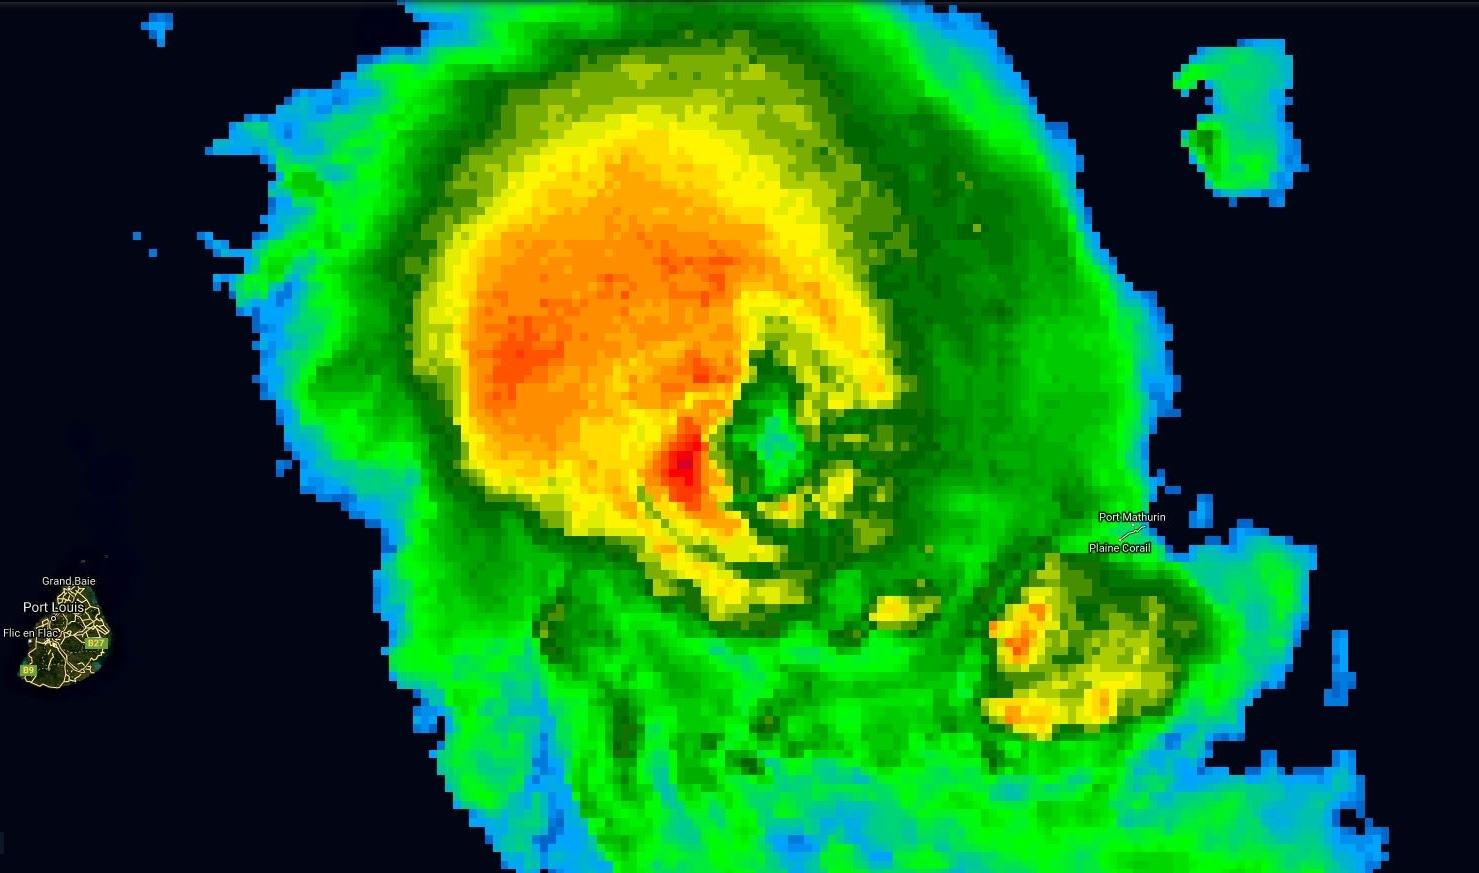 Photo satellite de 20heures.